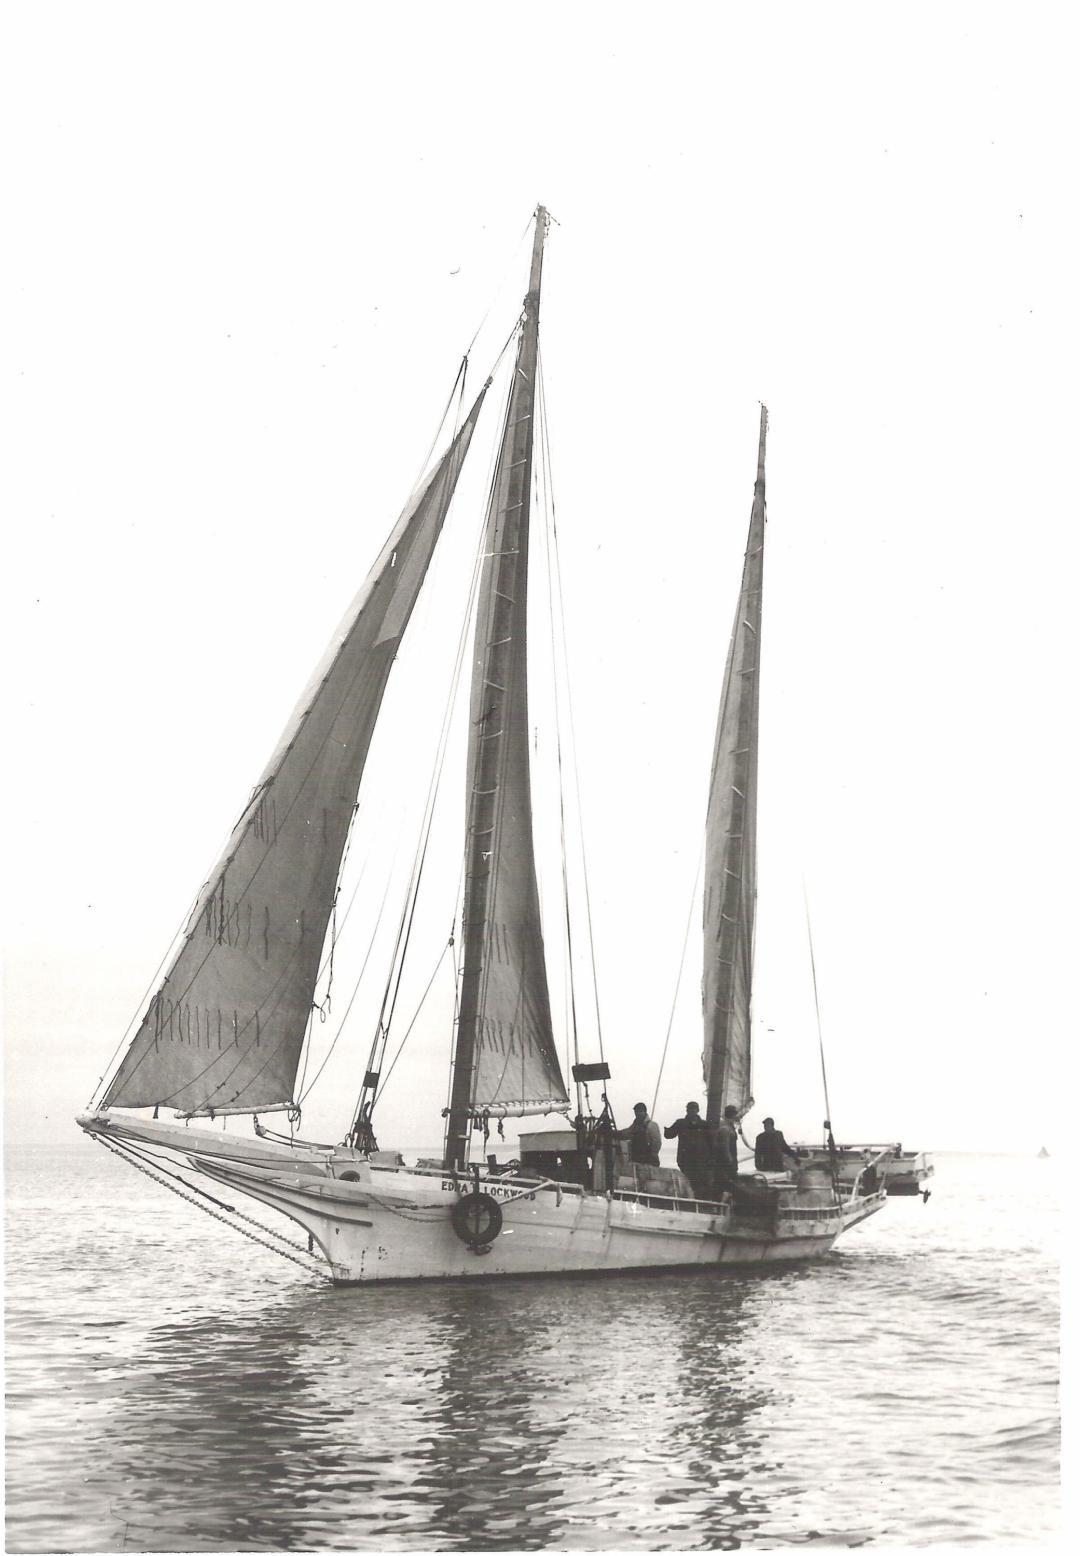 1889 bugeye Edna Lockwood dredges for oysters around 1950.